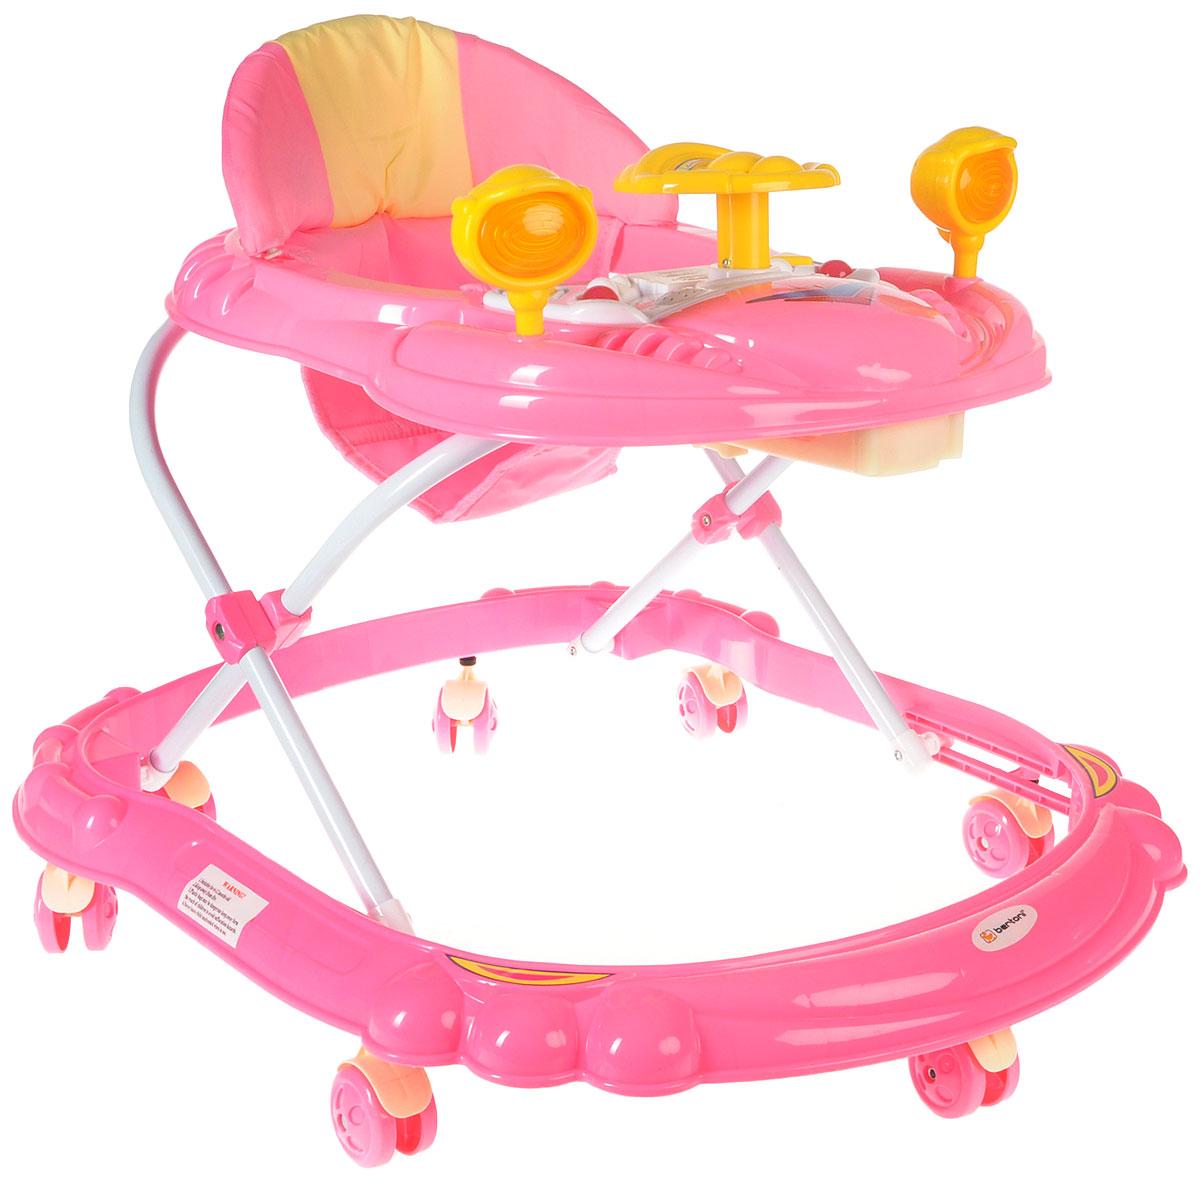 Bertoni Ходунки BW 14 цвет розовый белый -  Ходунки, прыгунки, качалки